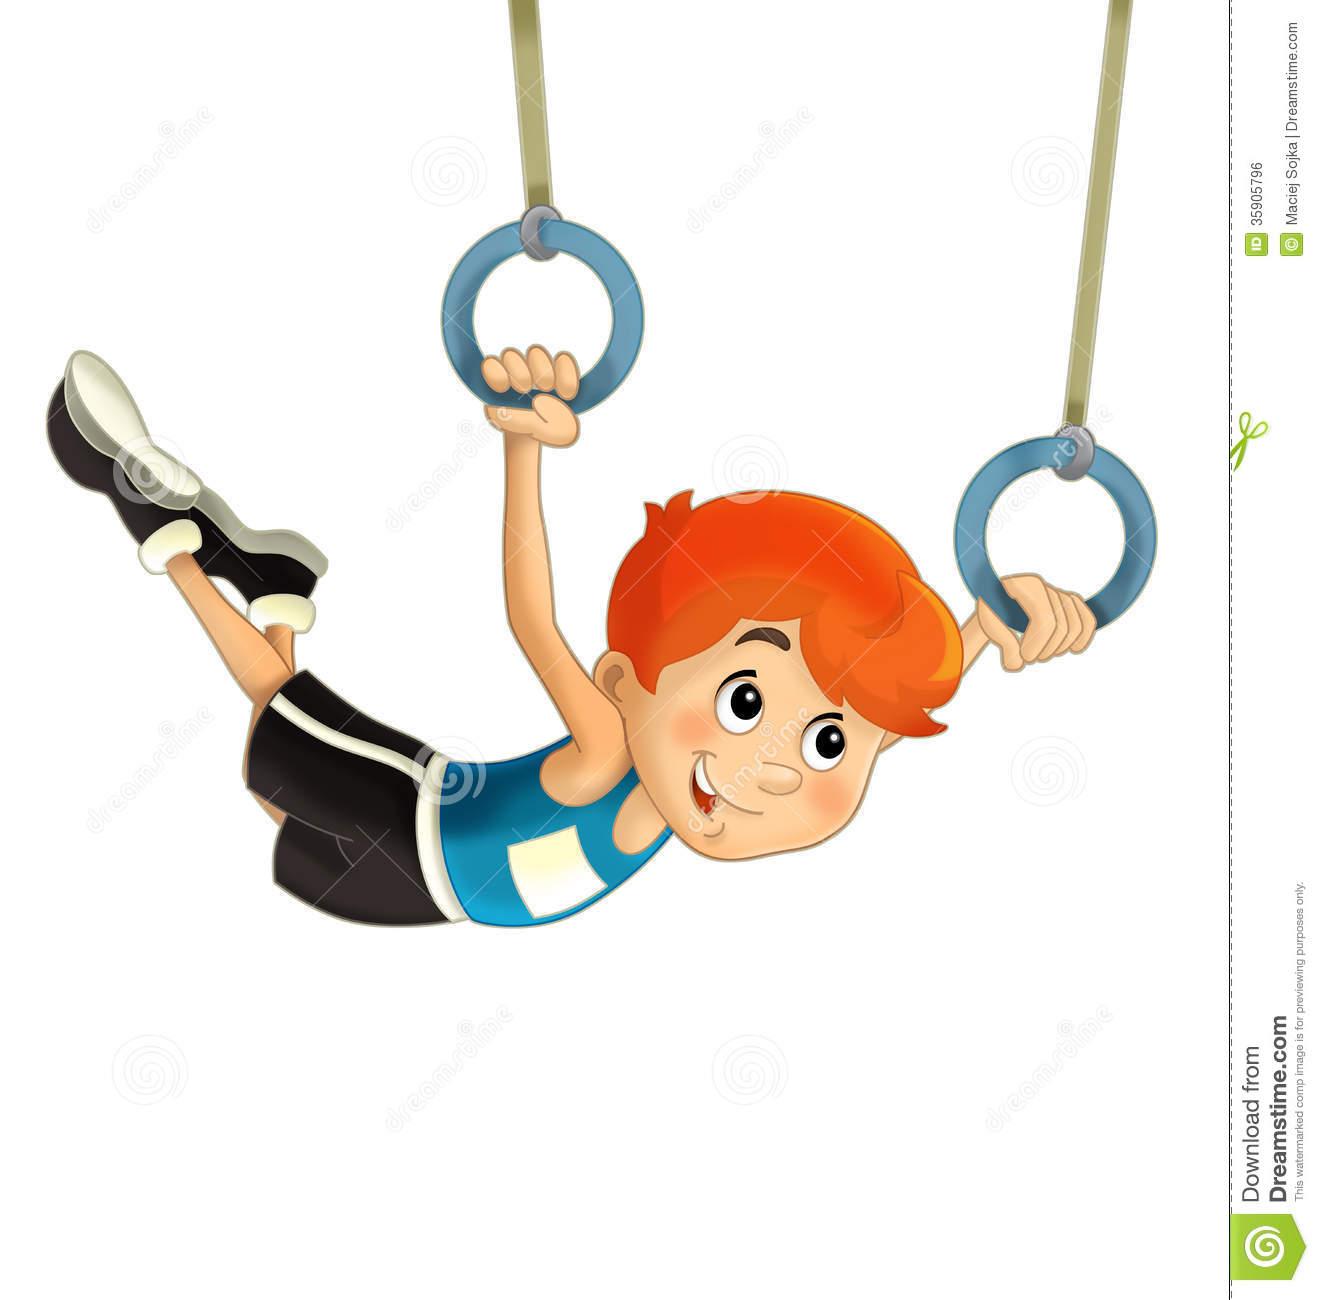 Gymnastics clipart animated. Cartoon gymnastic free download